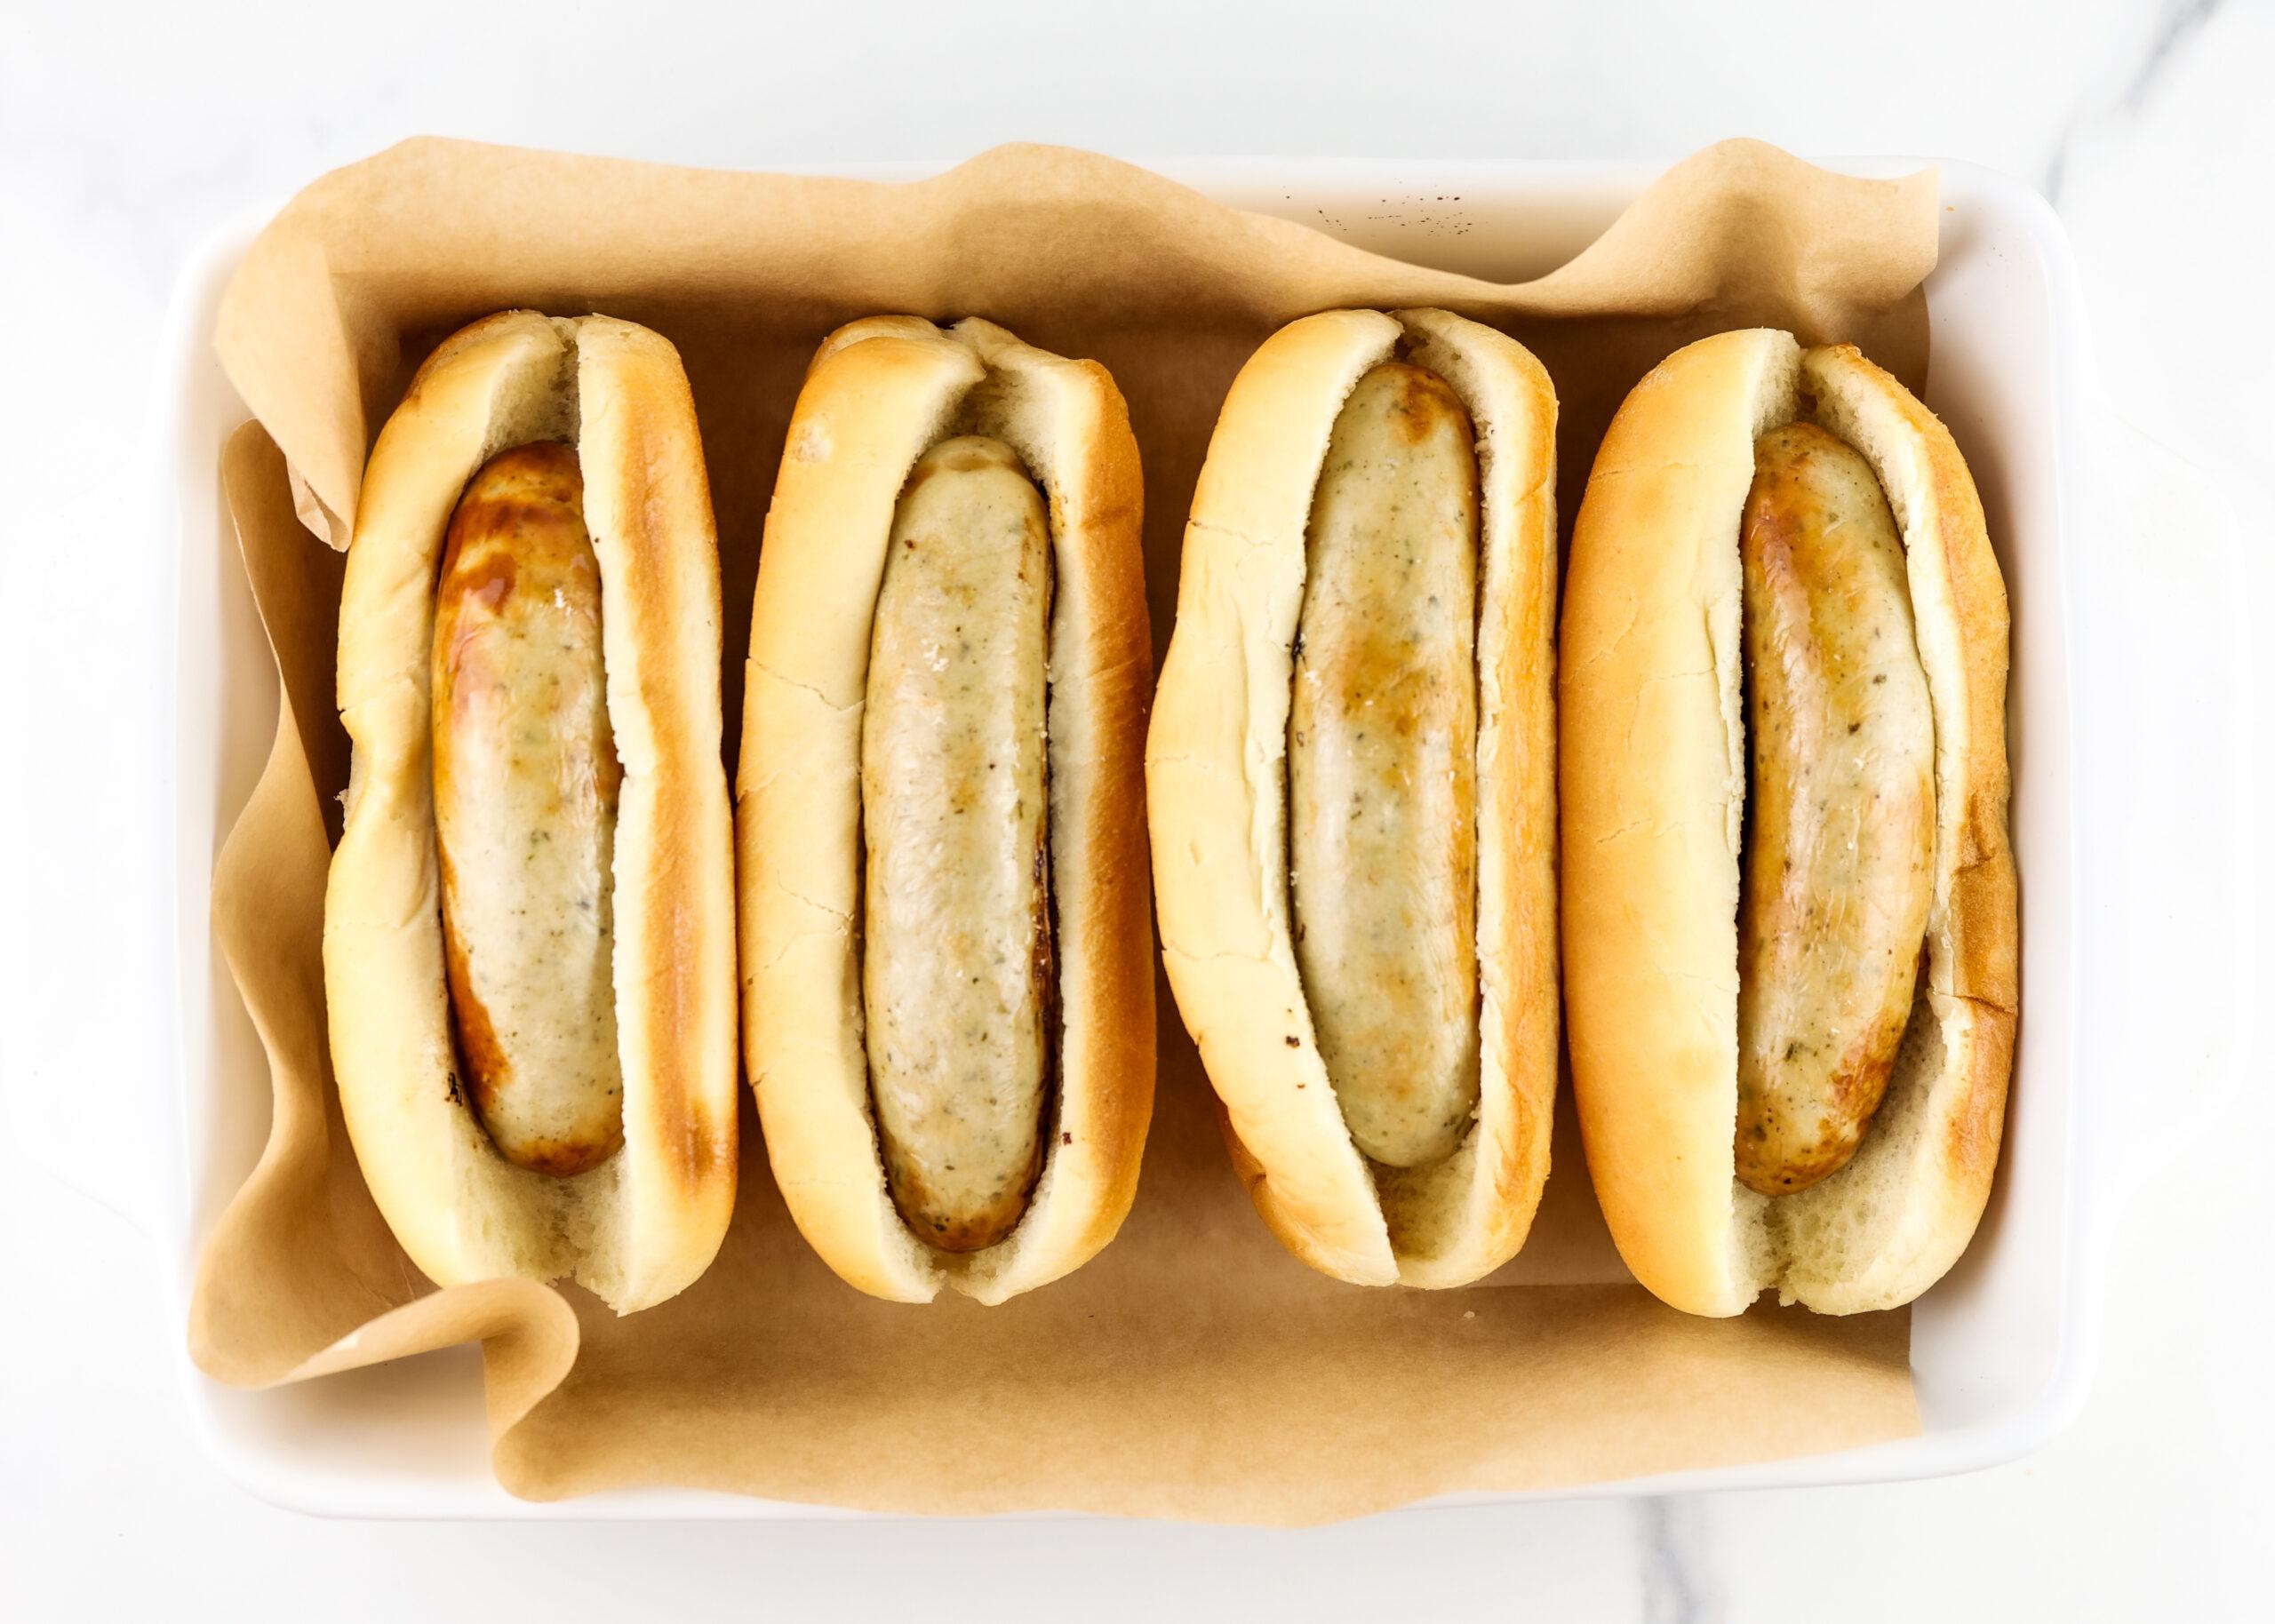 Air fryer bratwurst in buns in a casserole dish.